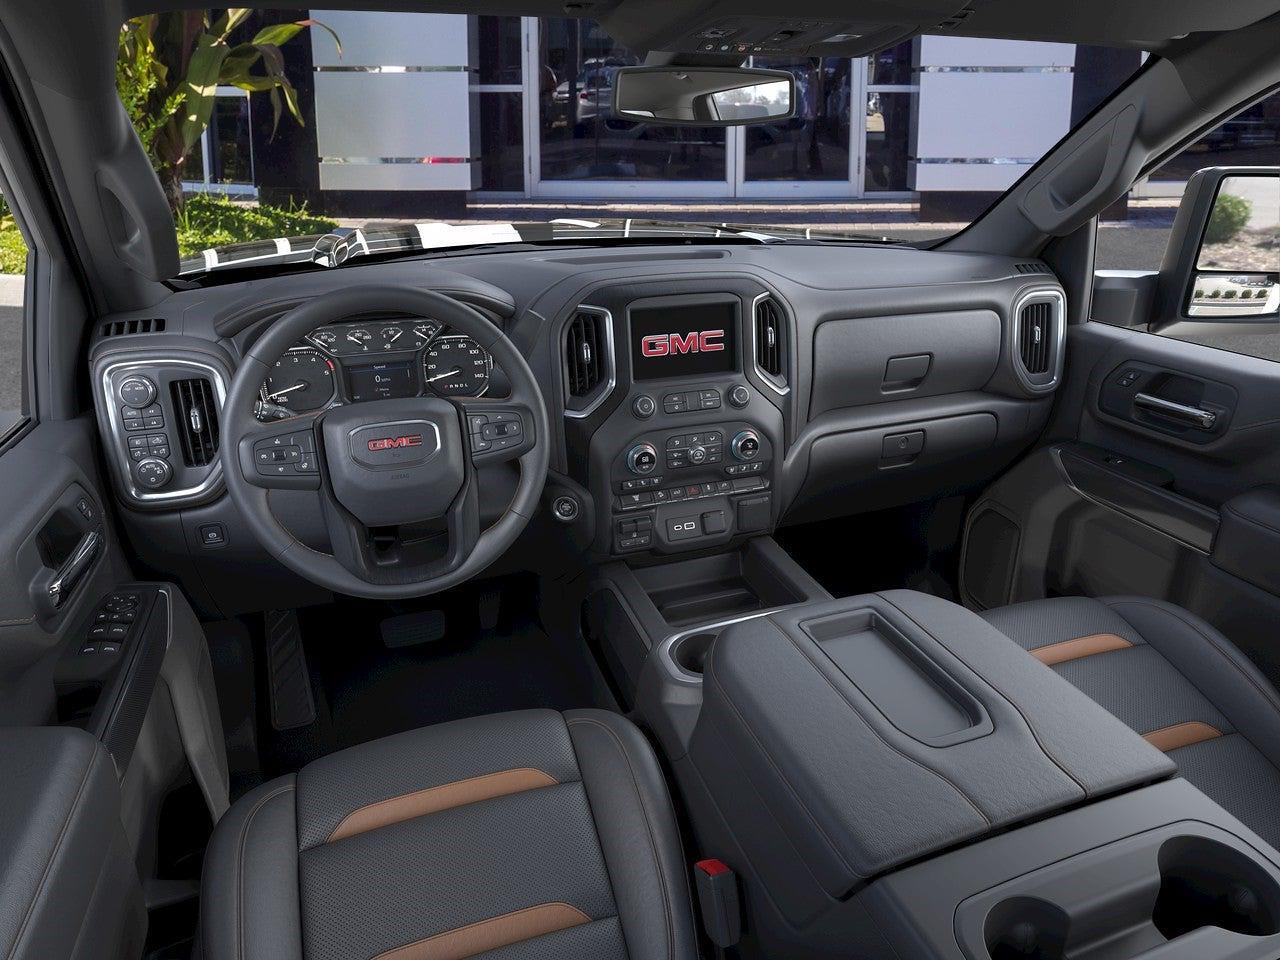 2021 GMC Sierra 2500 Crew Cab 4x4, Pickup #T21433 - photo 32